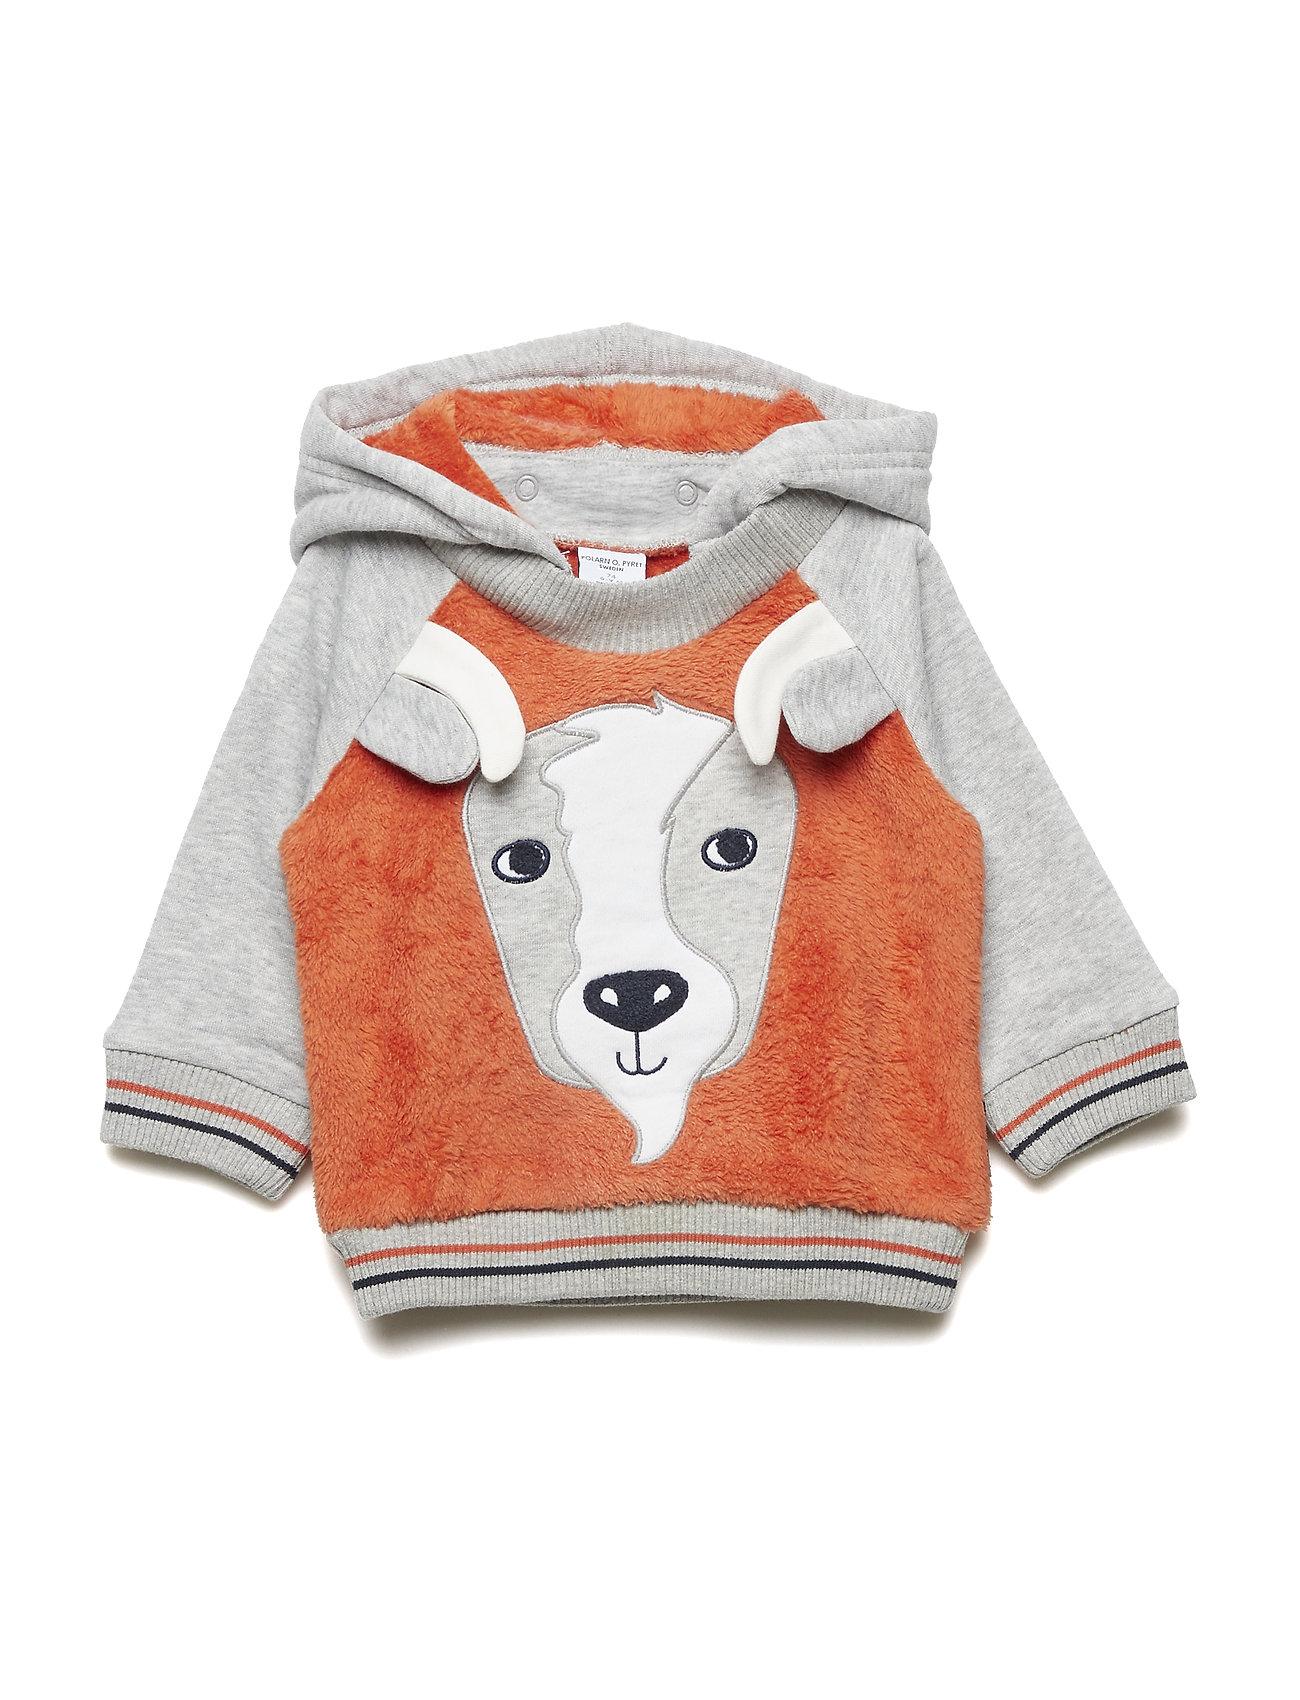 Polarn O. Pyret Sweatshirt Hood Baby - BURNT OCHRE